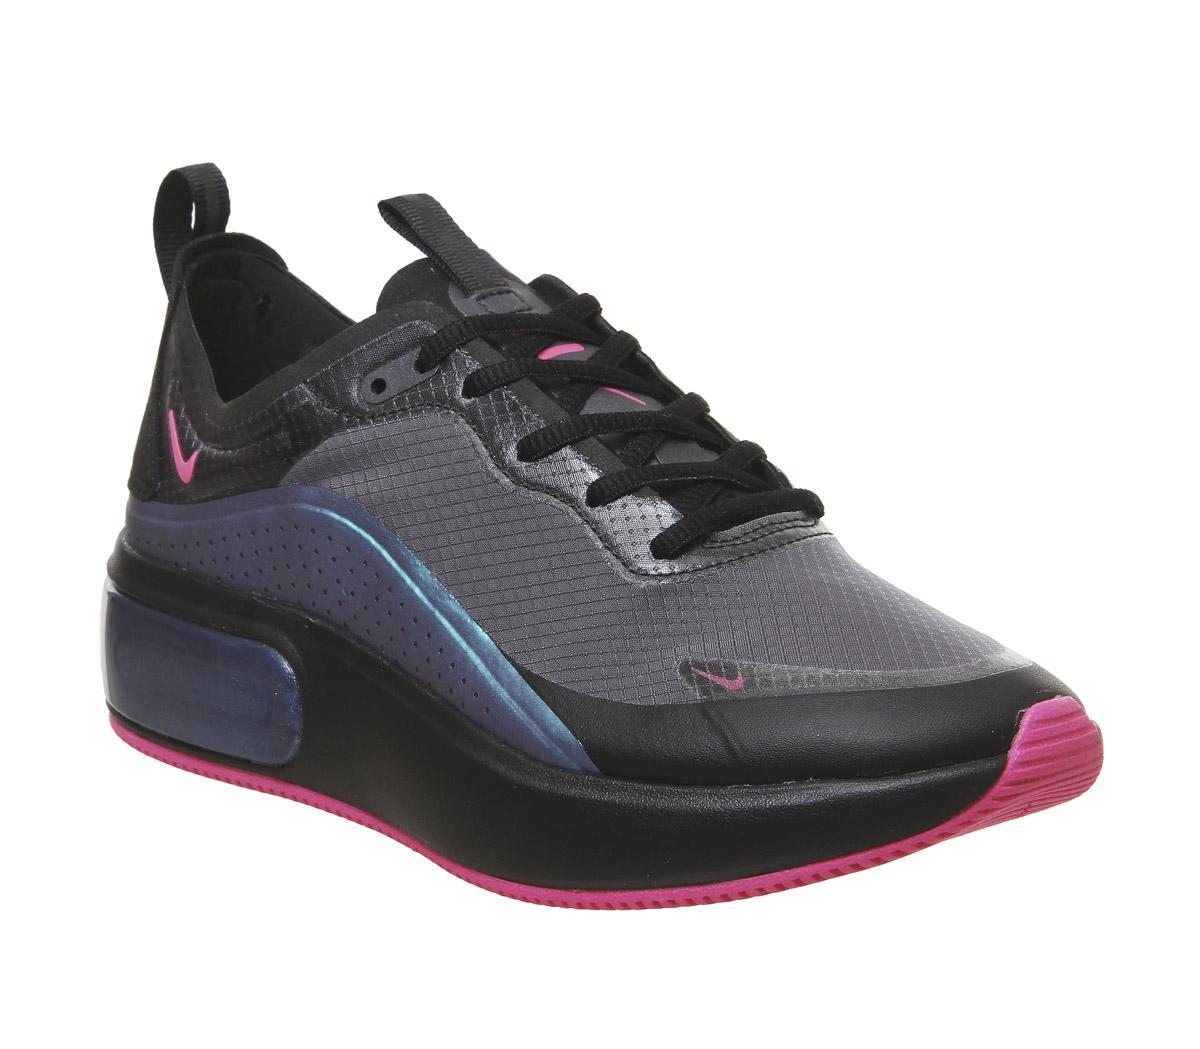 Nike Air Max Dia Trainers Black Laser